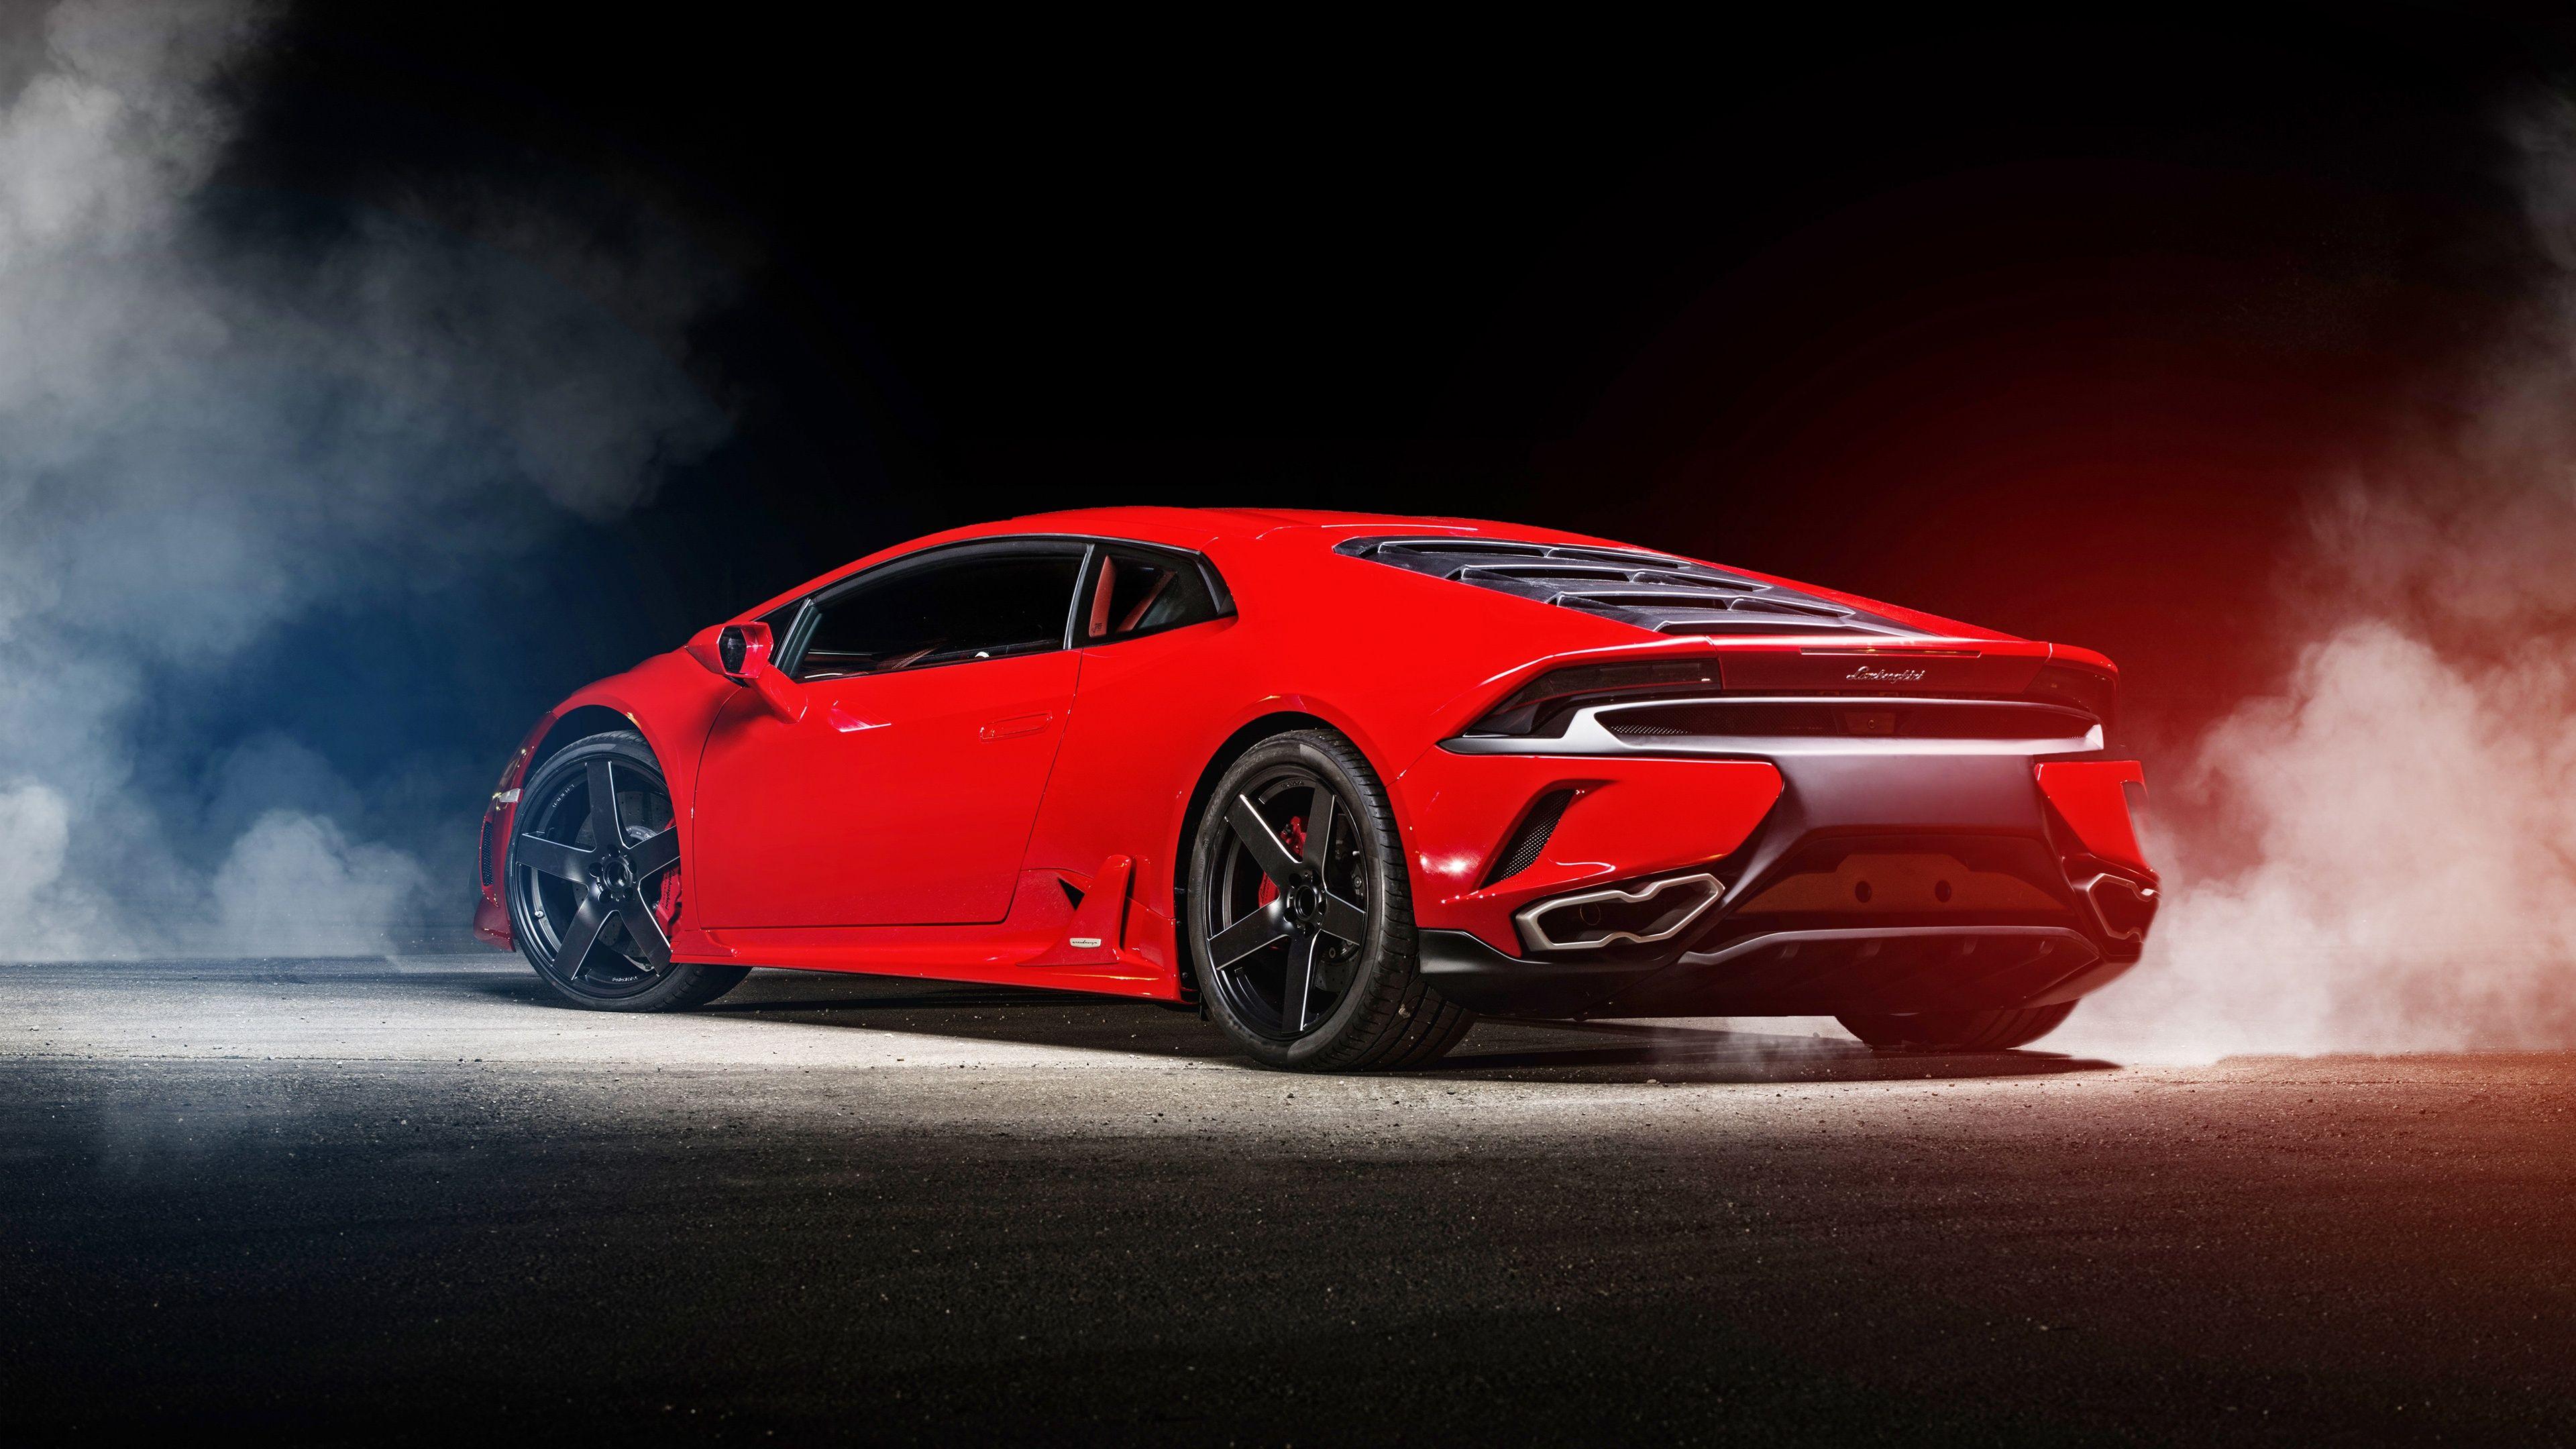 b691a495514afa4eabb2ddec49729447 Exciting Lamborghini Huracán Lp 610-4 Cena Cars Trend